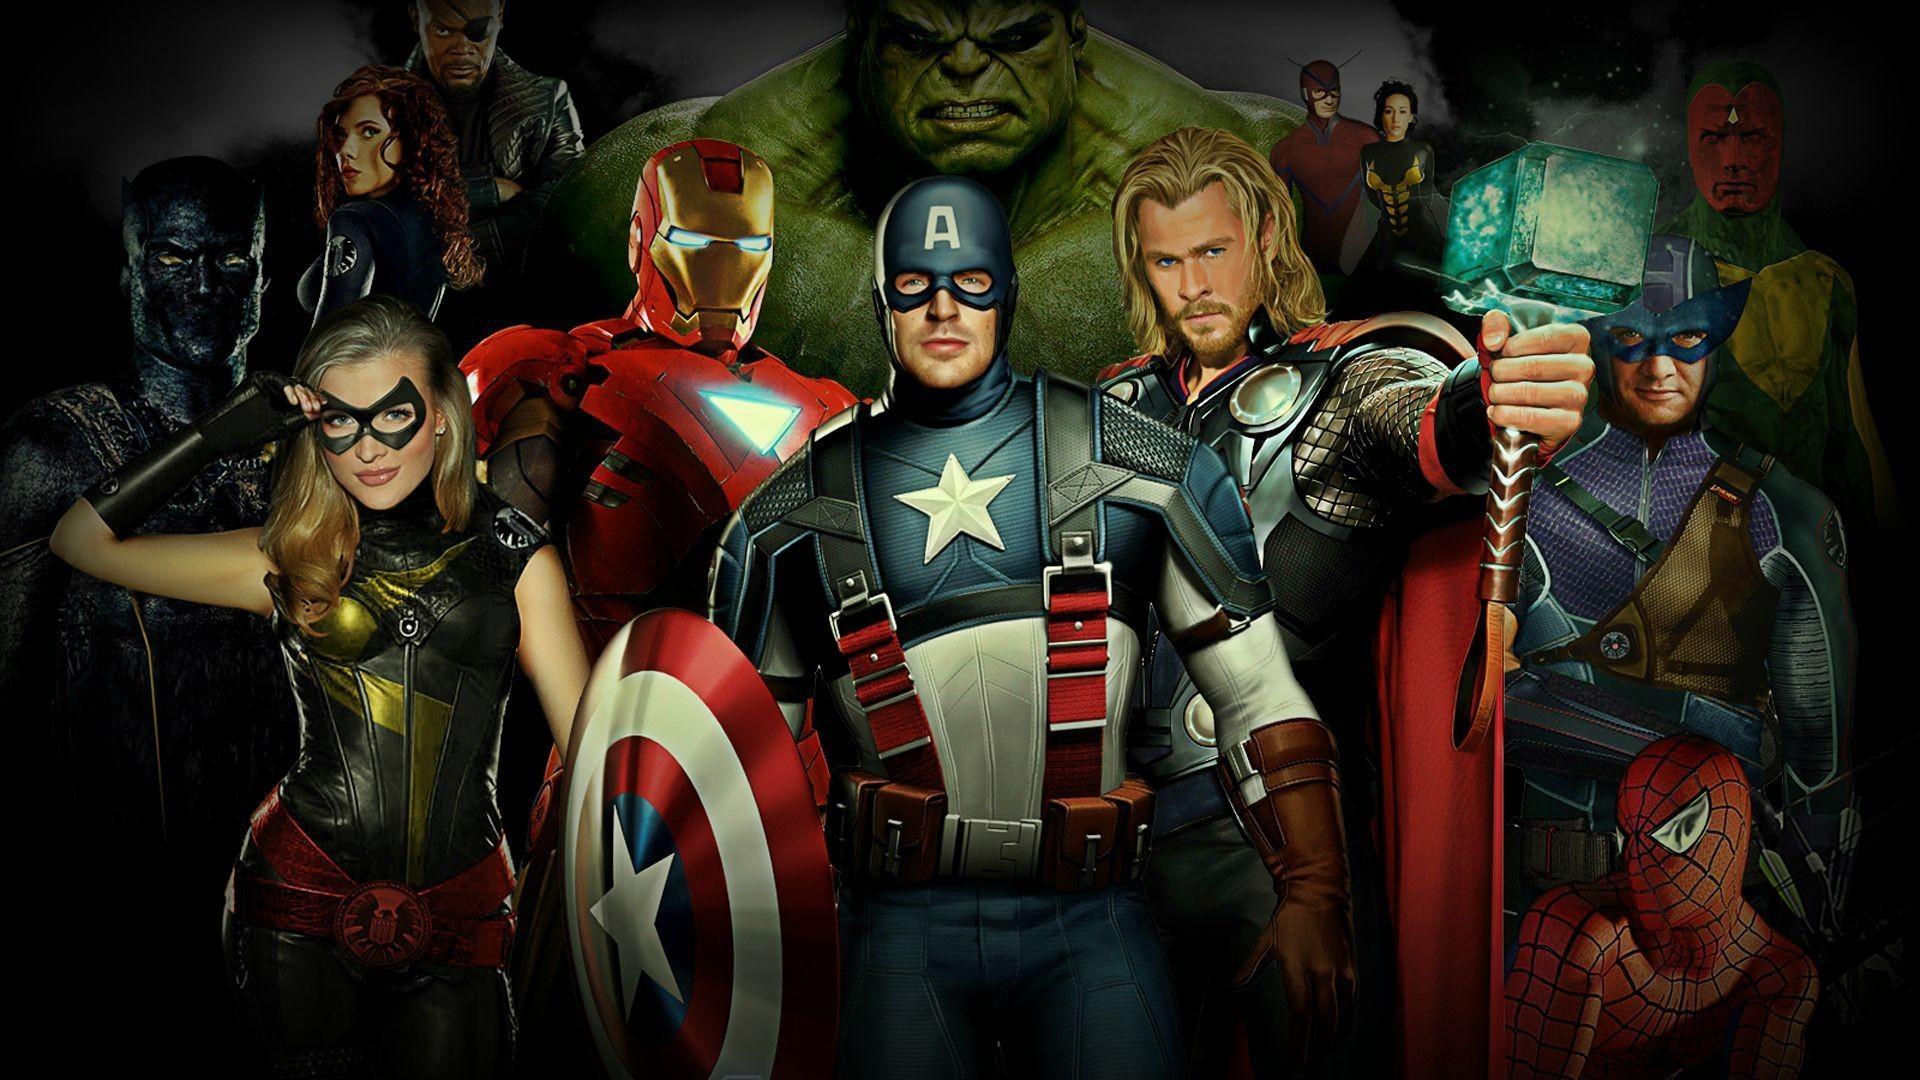 1080x1920 Captain America Iphone Wallpaper Captainamericaiphonewallpaper